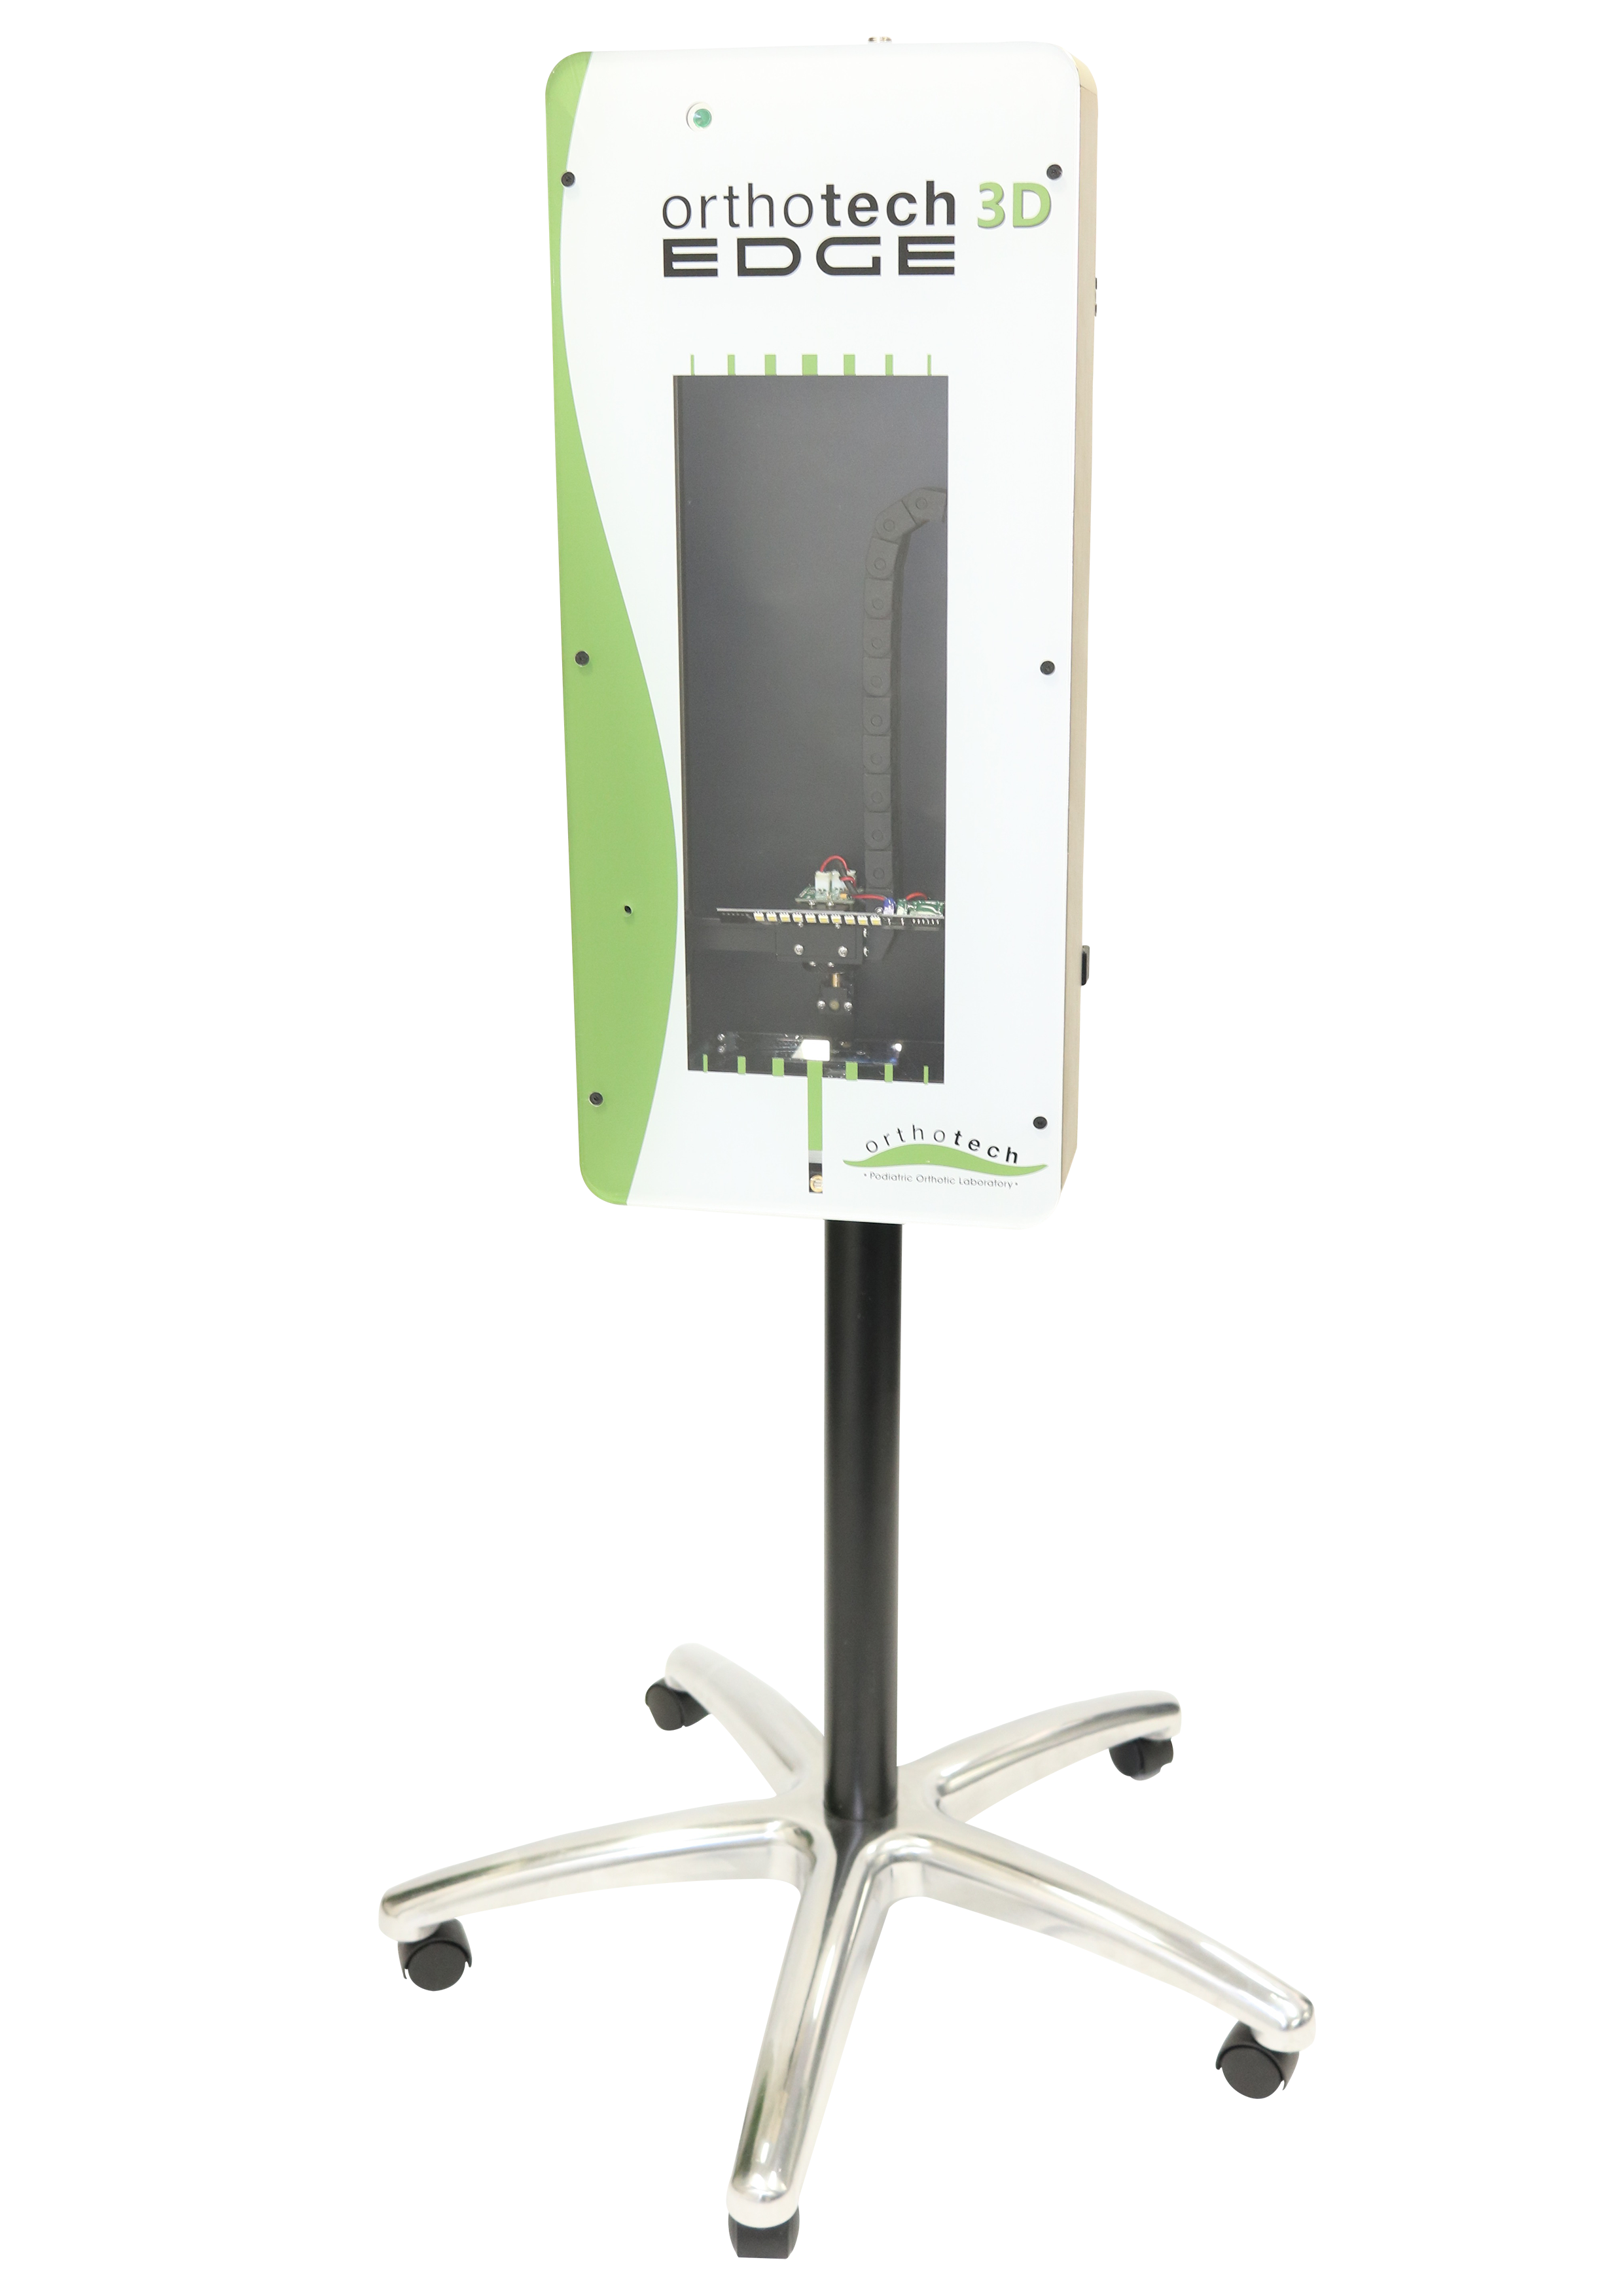 Orthotech 3D EDGE tripod